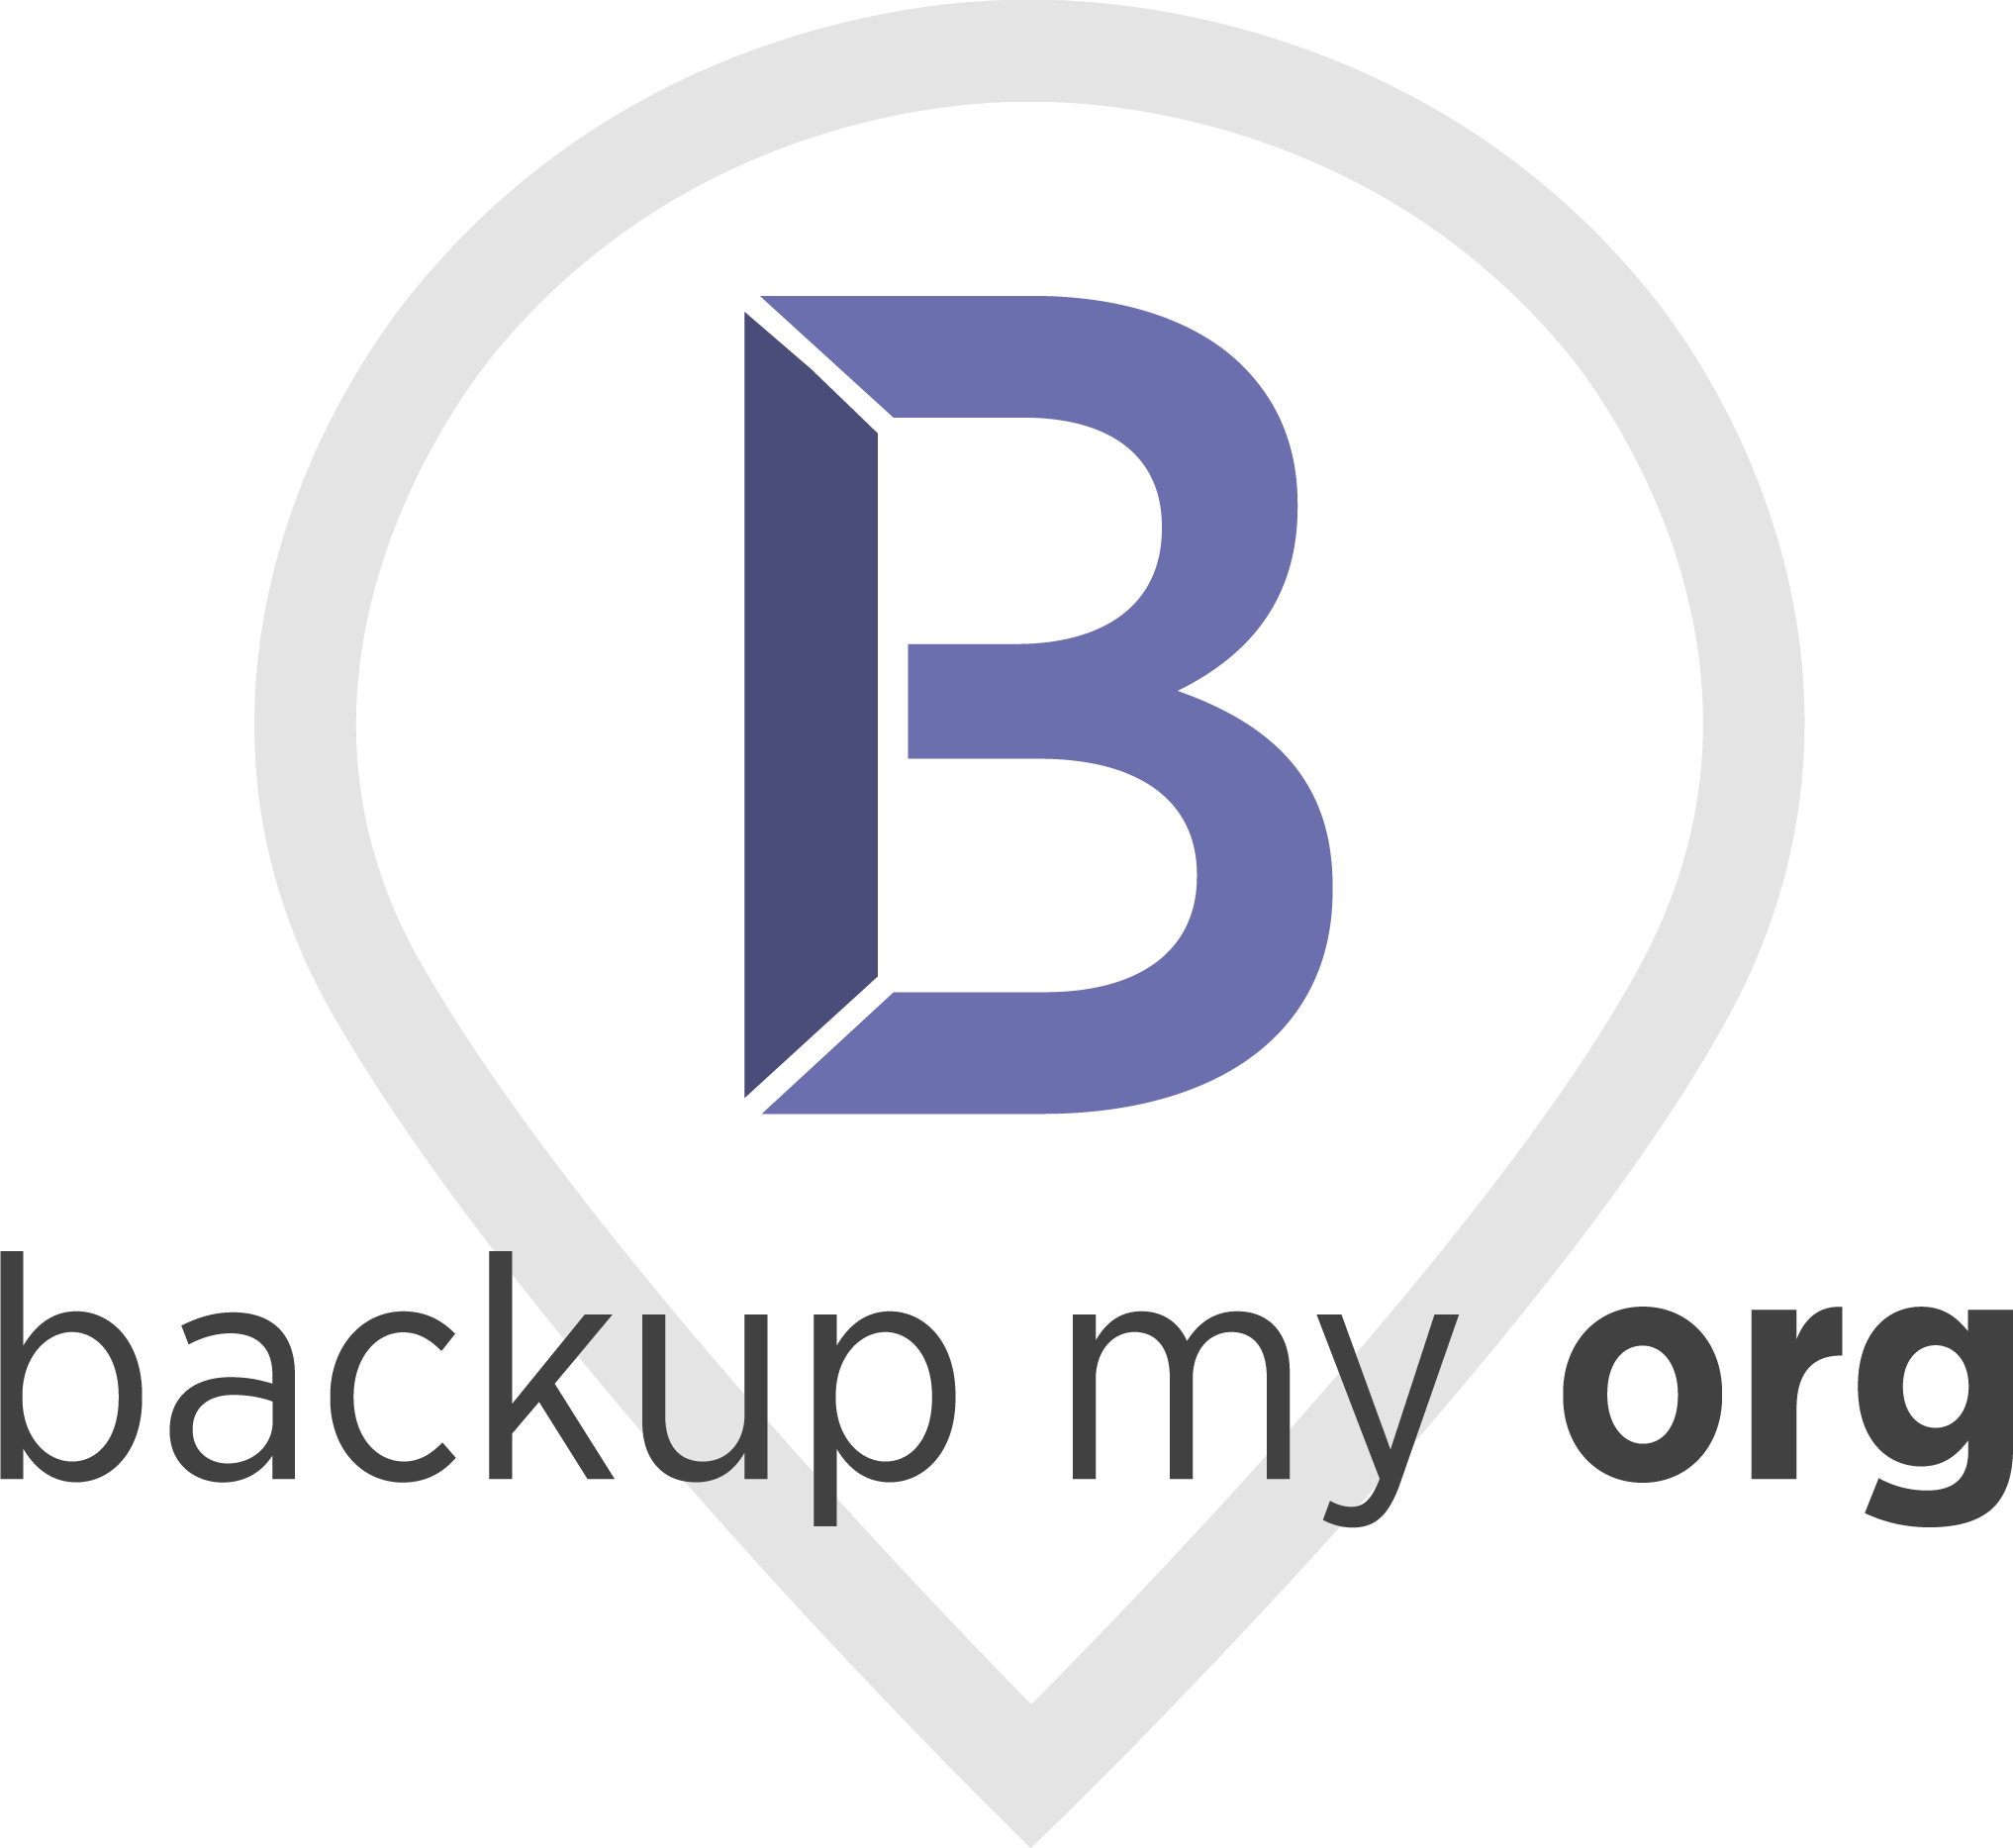 Backup My Org